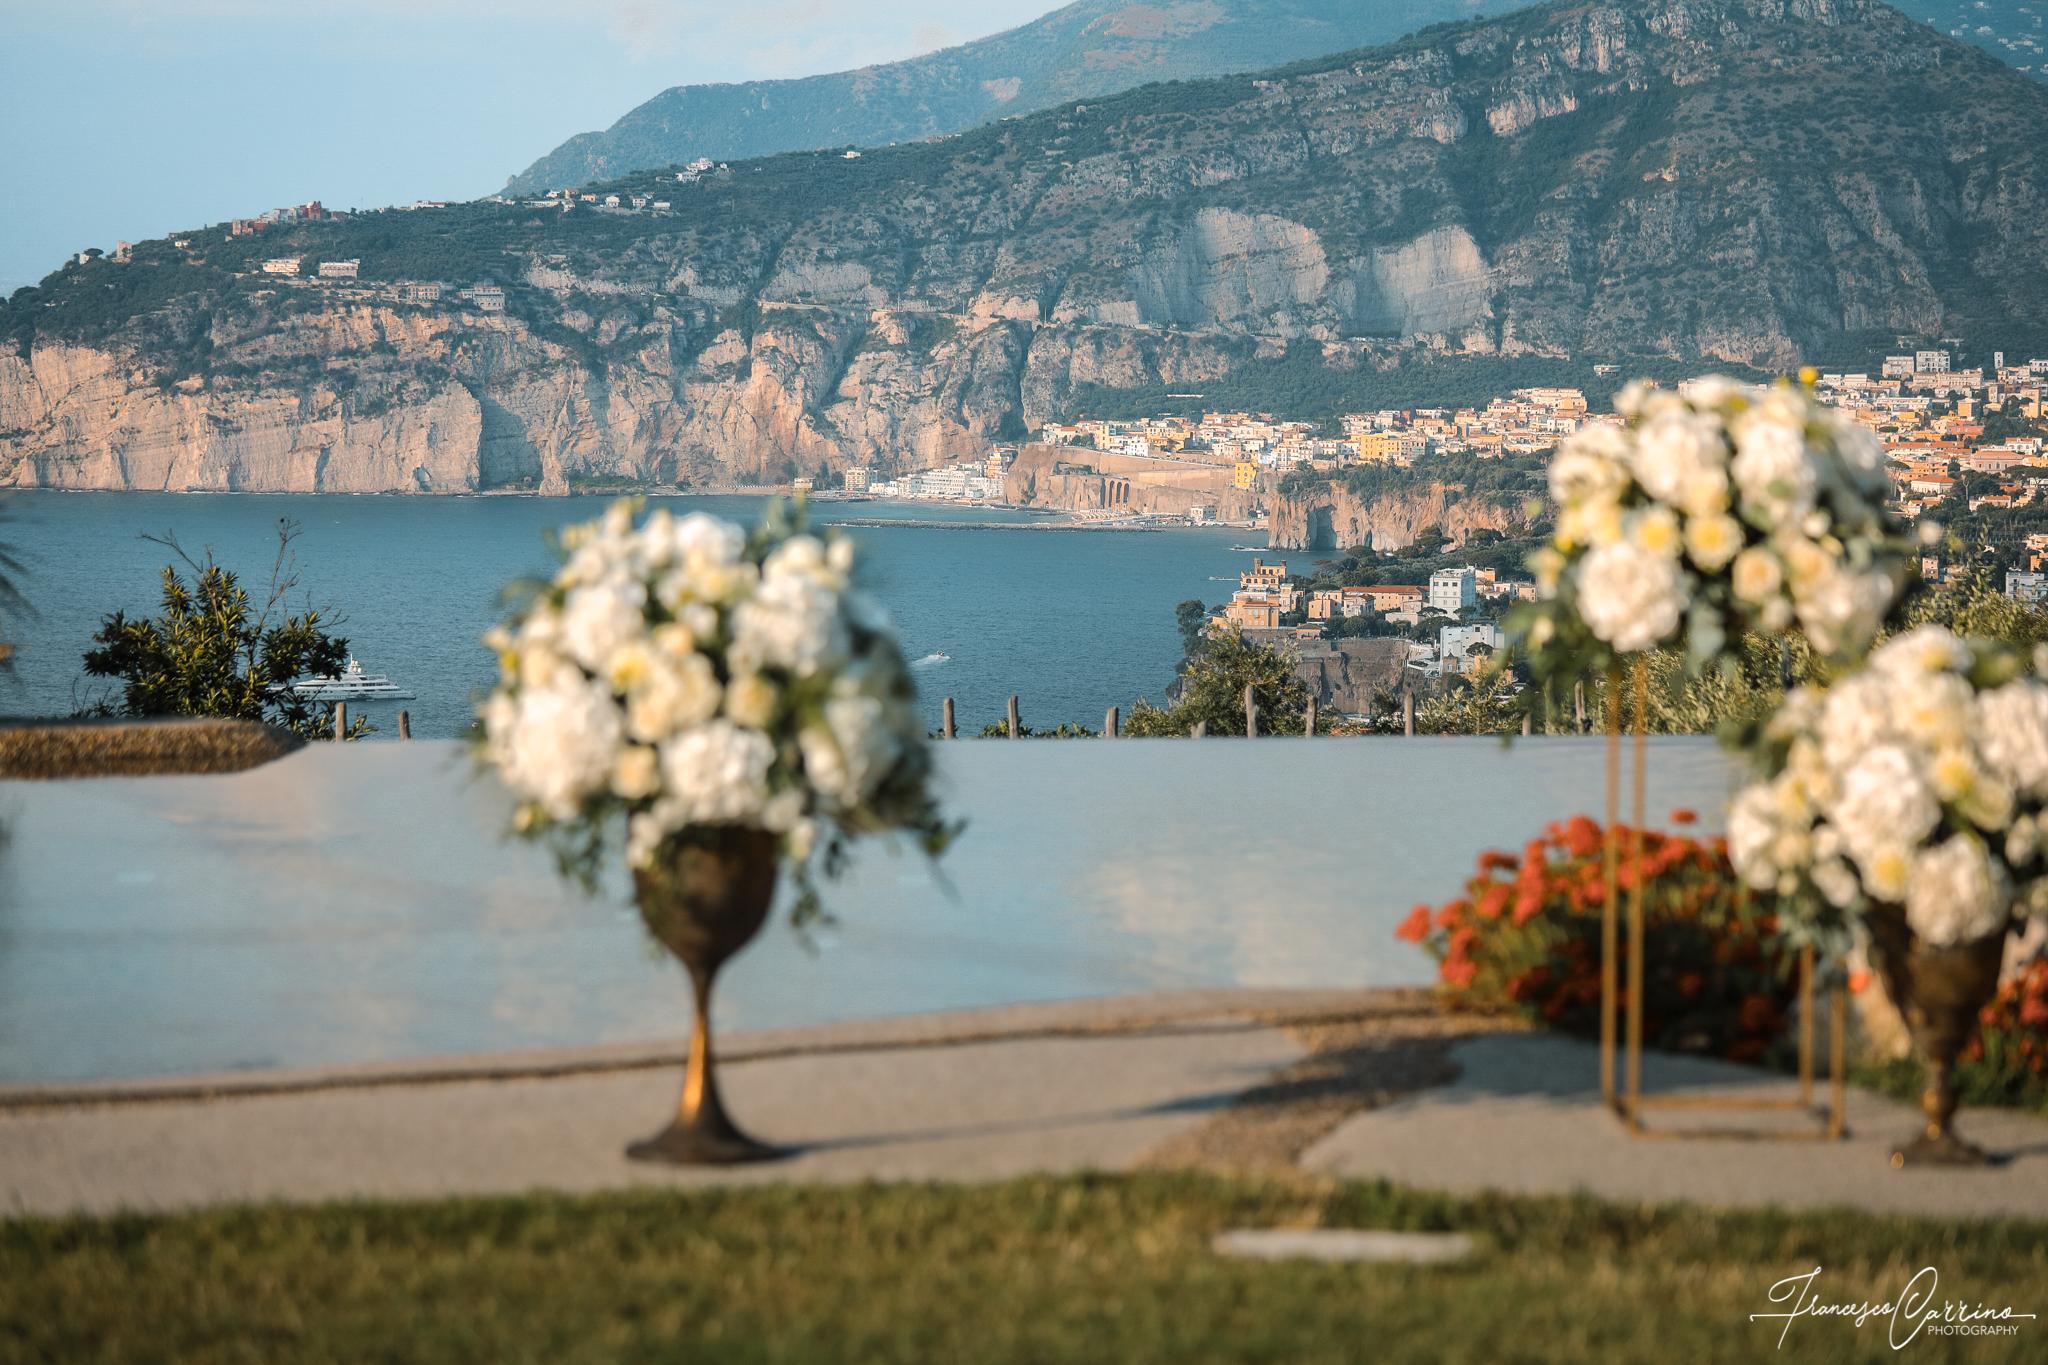 http://www.weddingamalfi.com/wp-content/uploads/Giannenza-13-luglio-2019-9.jpg